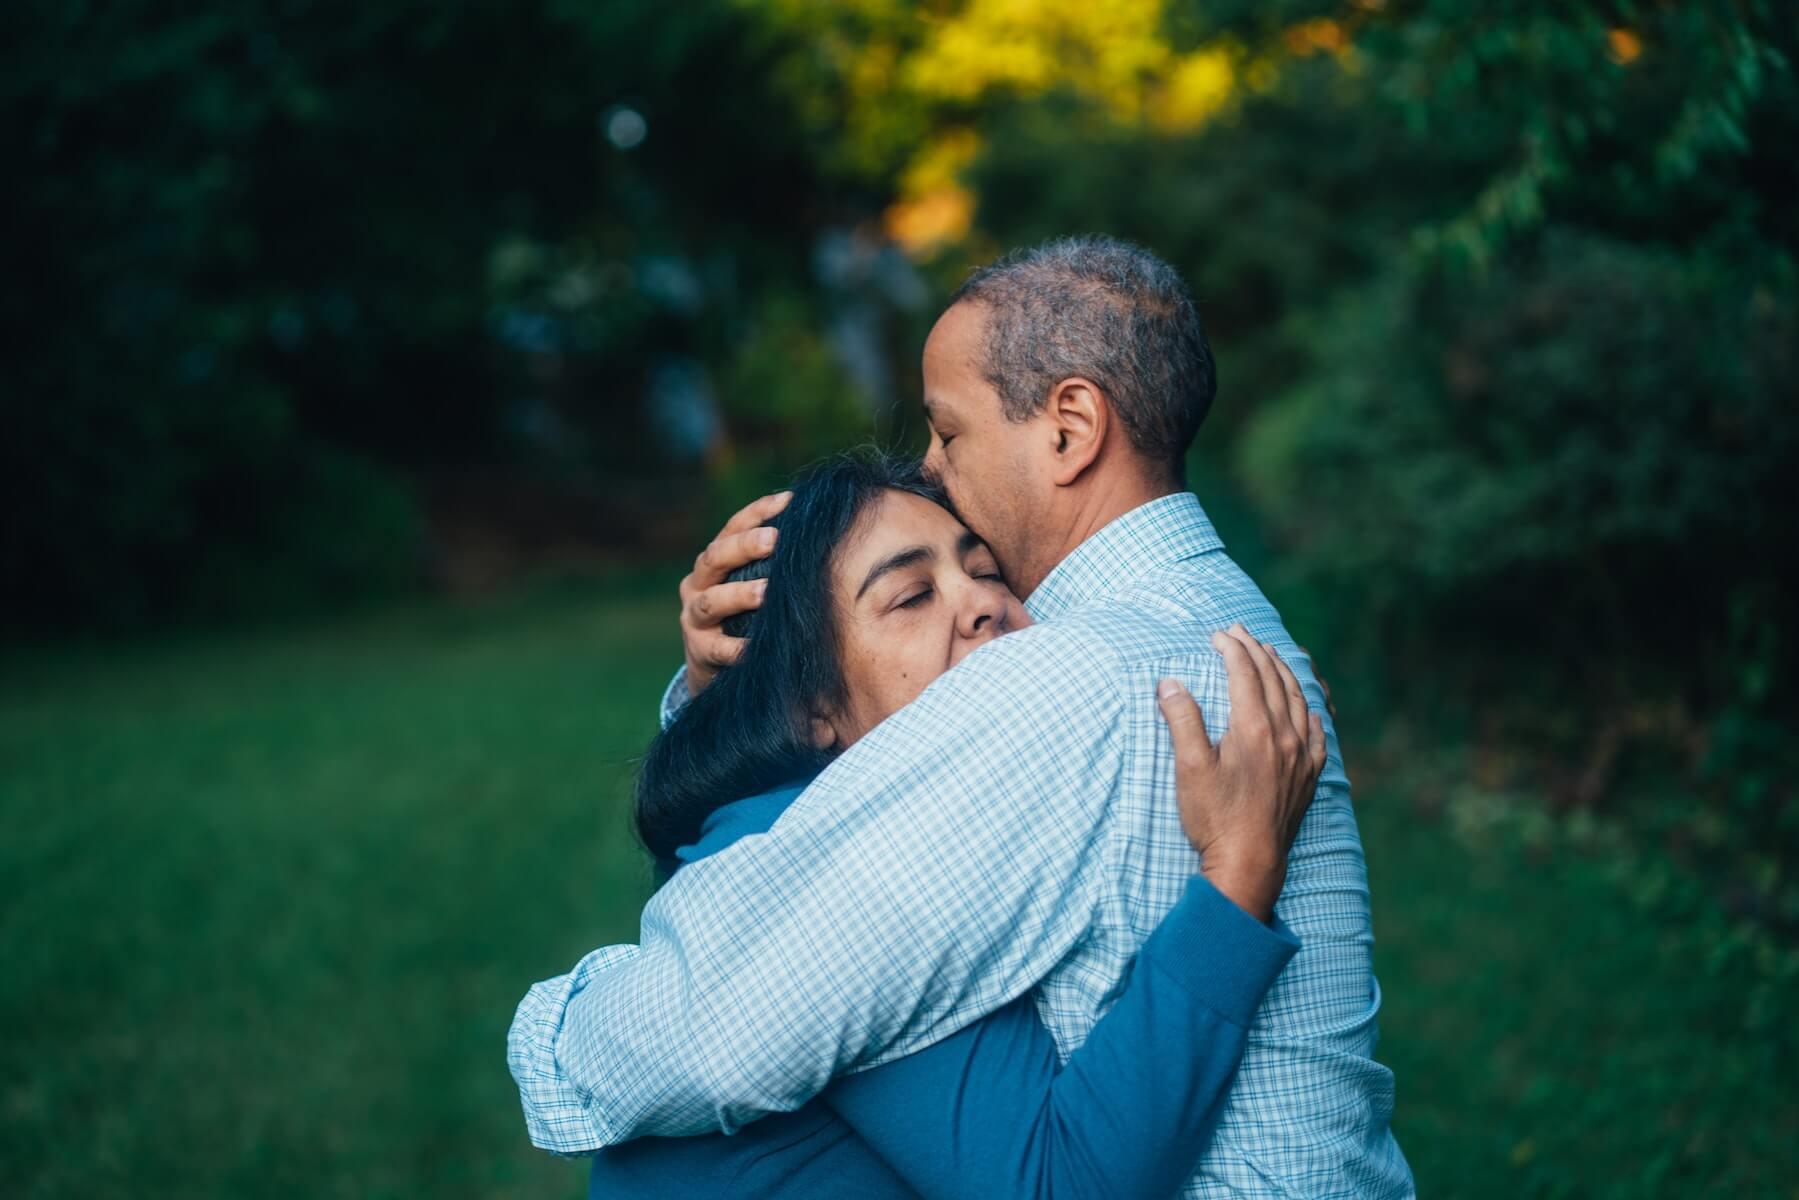 two people hugging cancer surviver oncology nurse